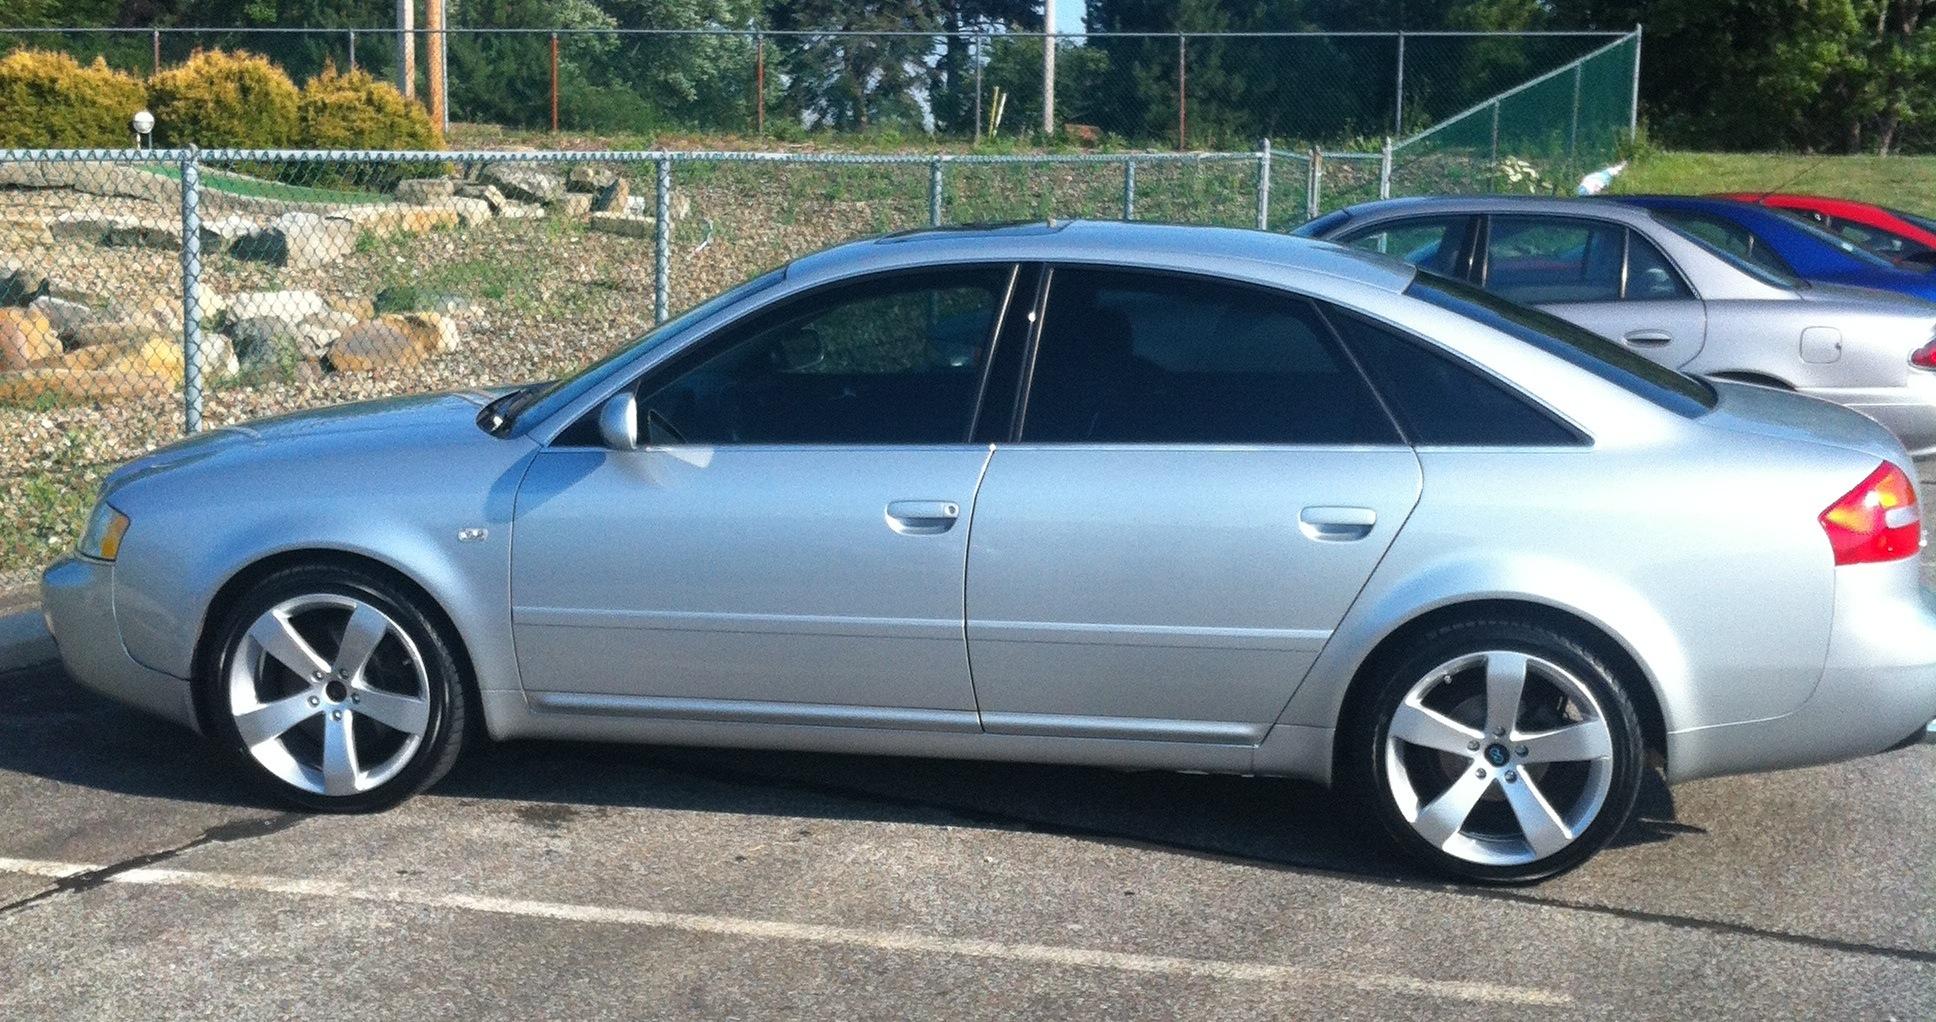 2003 Audi A6 Image 21